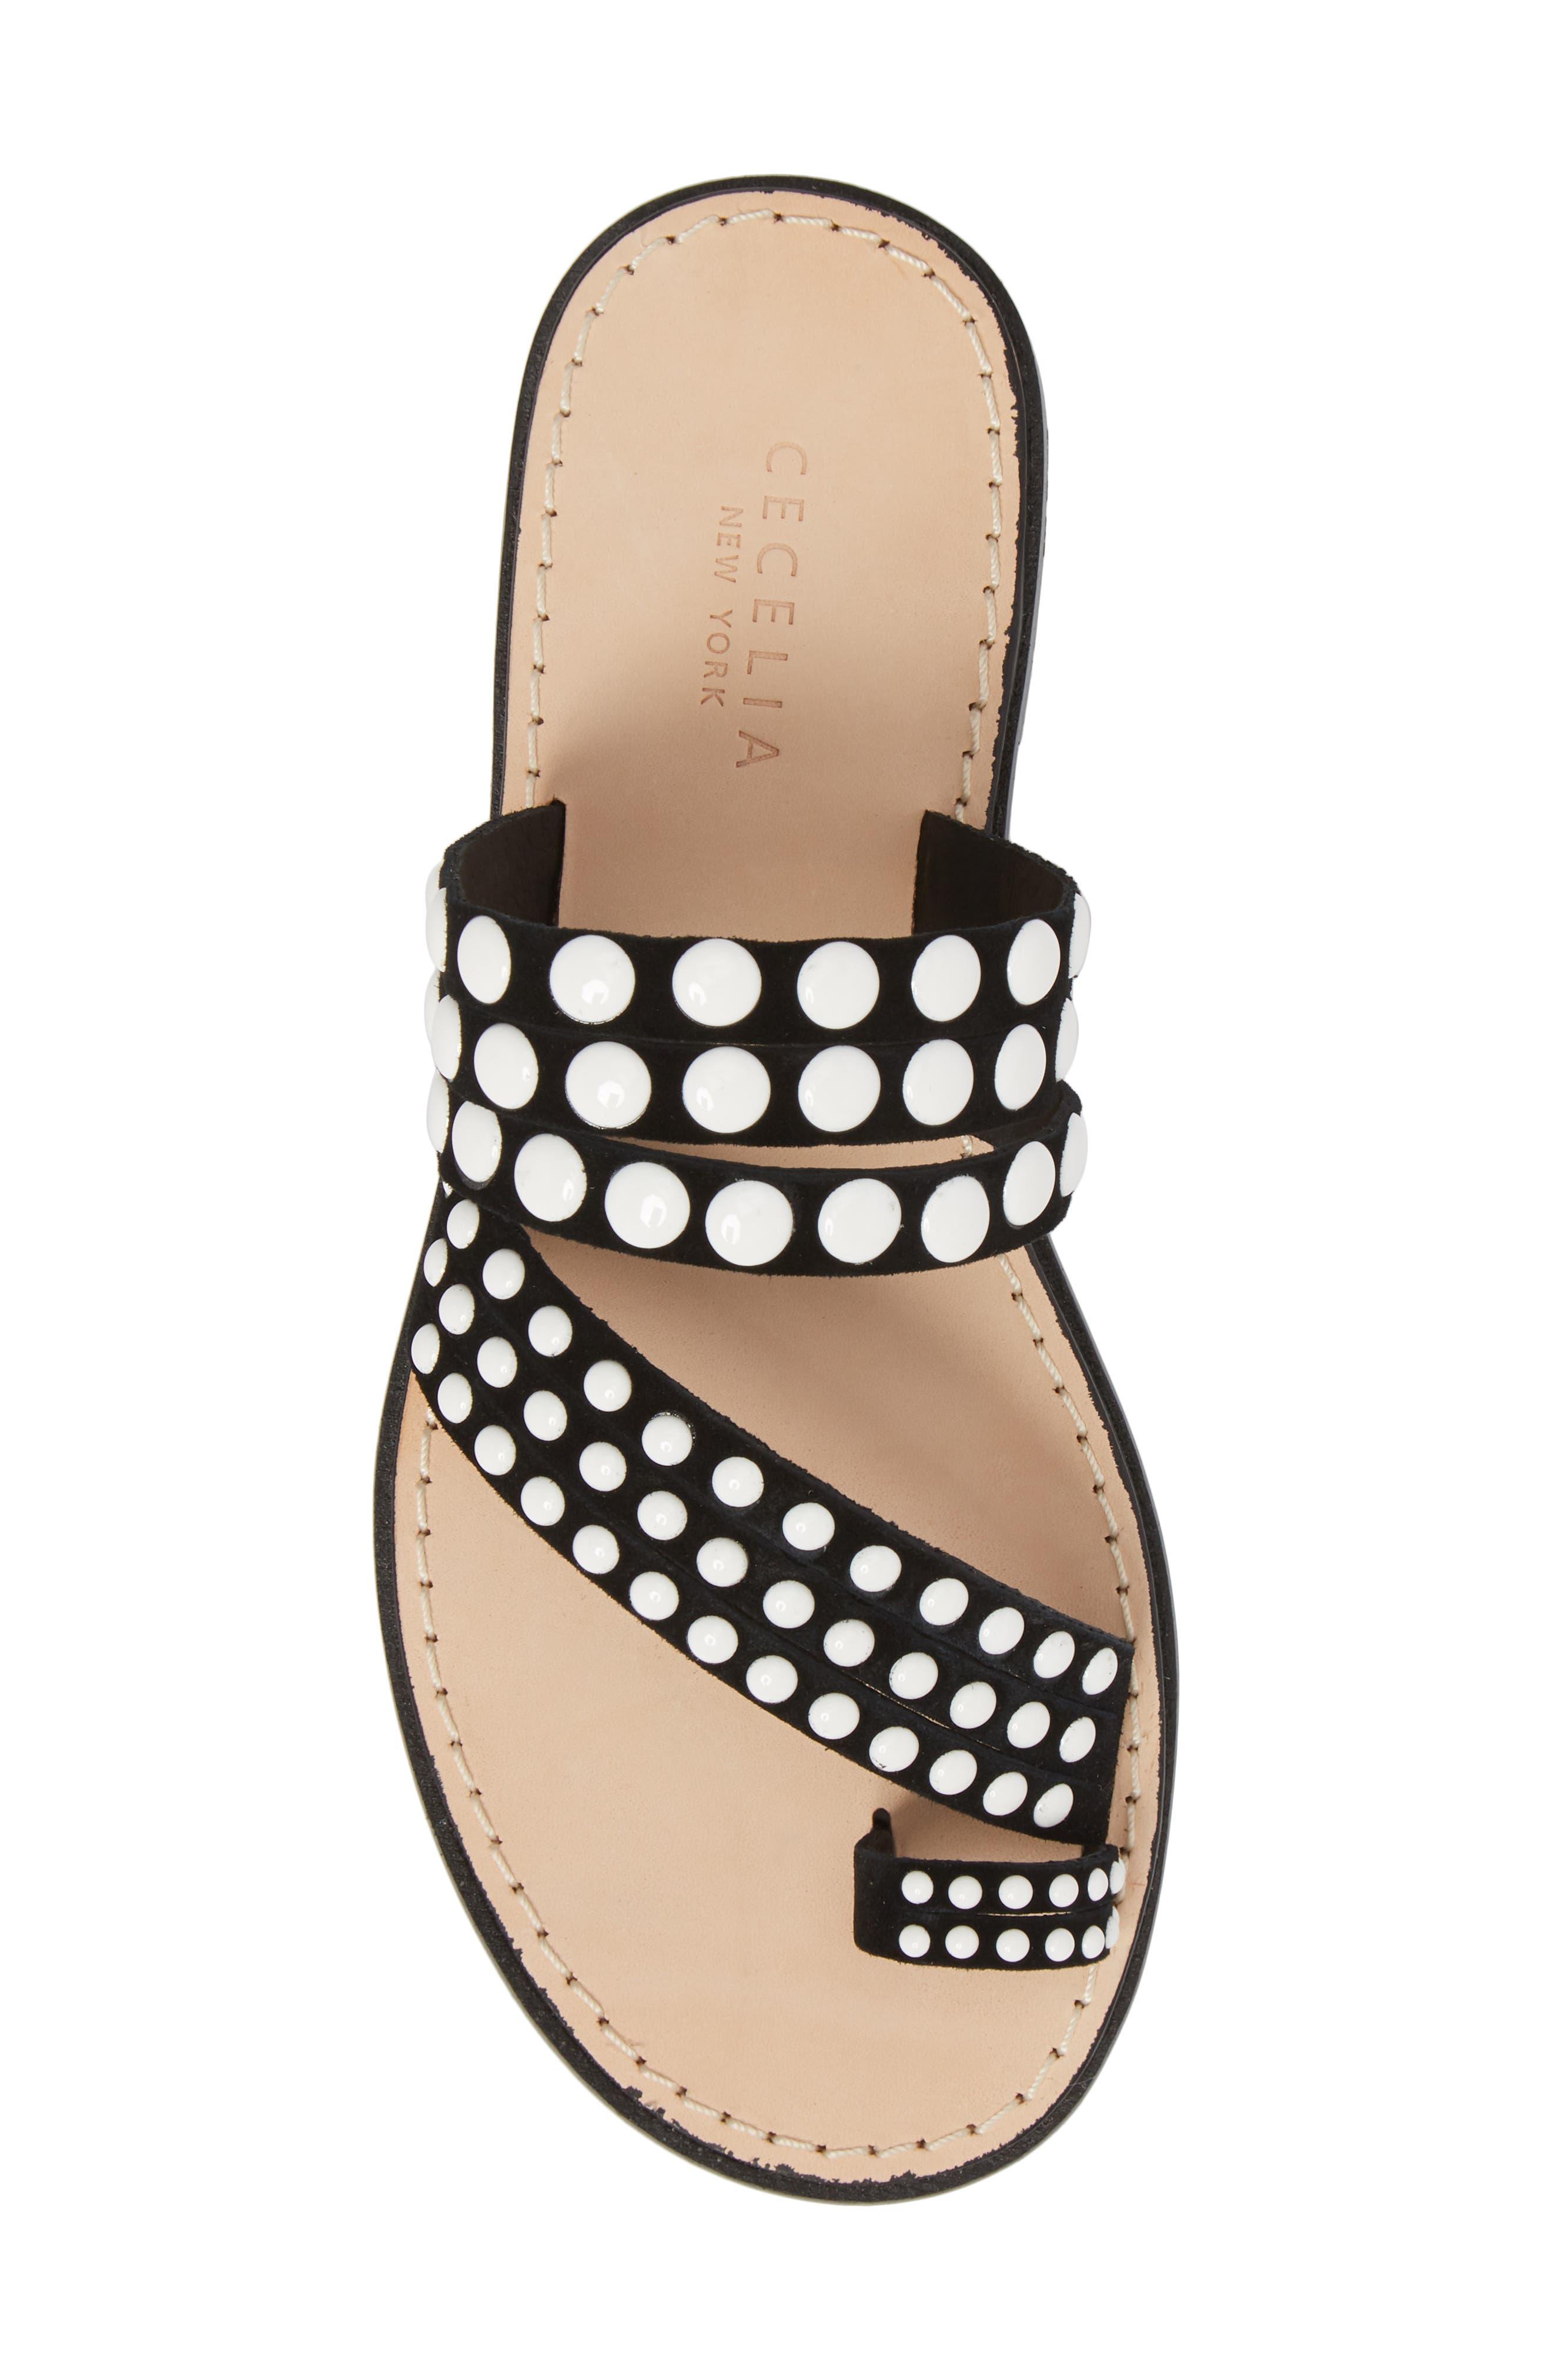 Pezz Studded Sandal,                             Alternate thumbnail 5, color,                             001